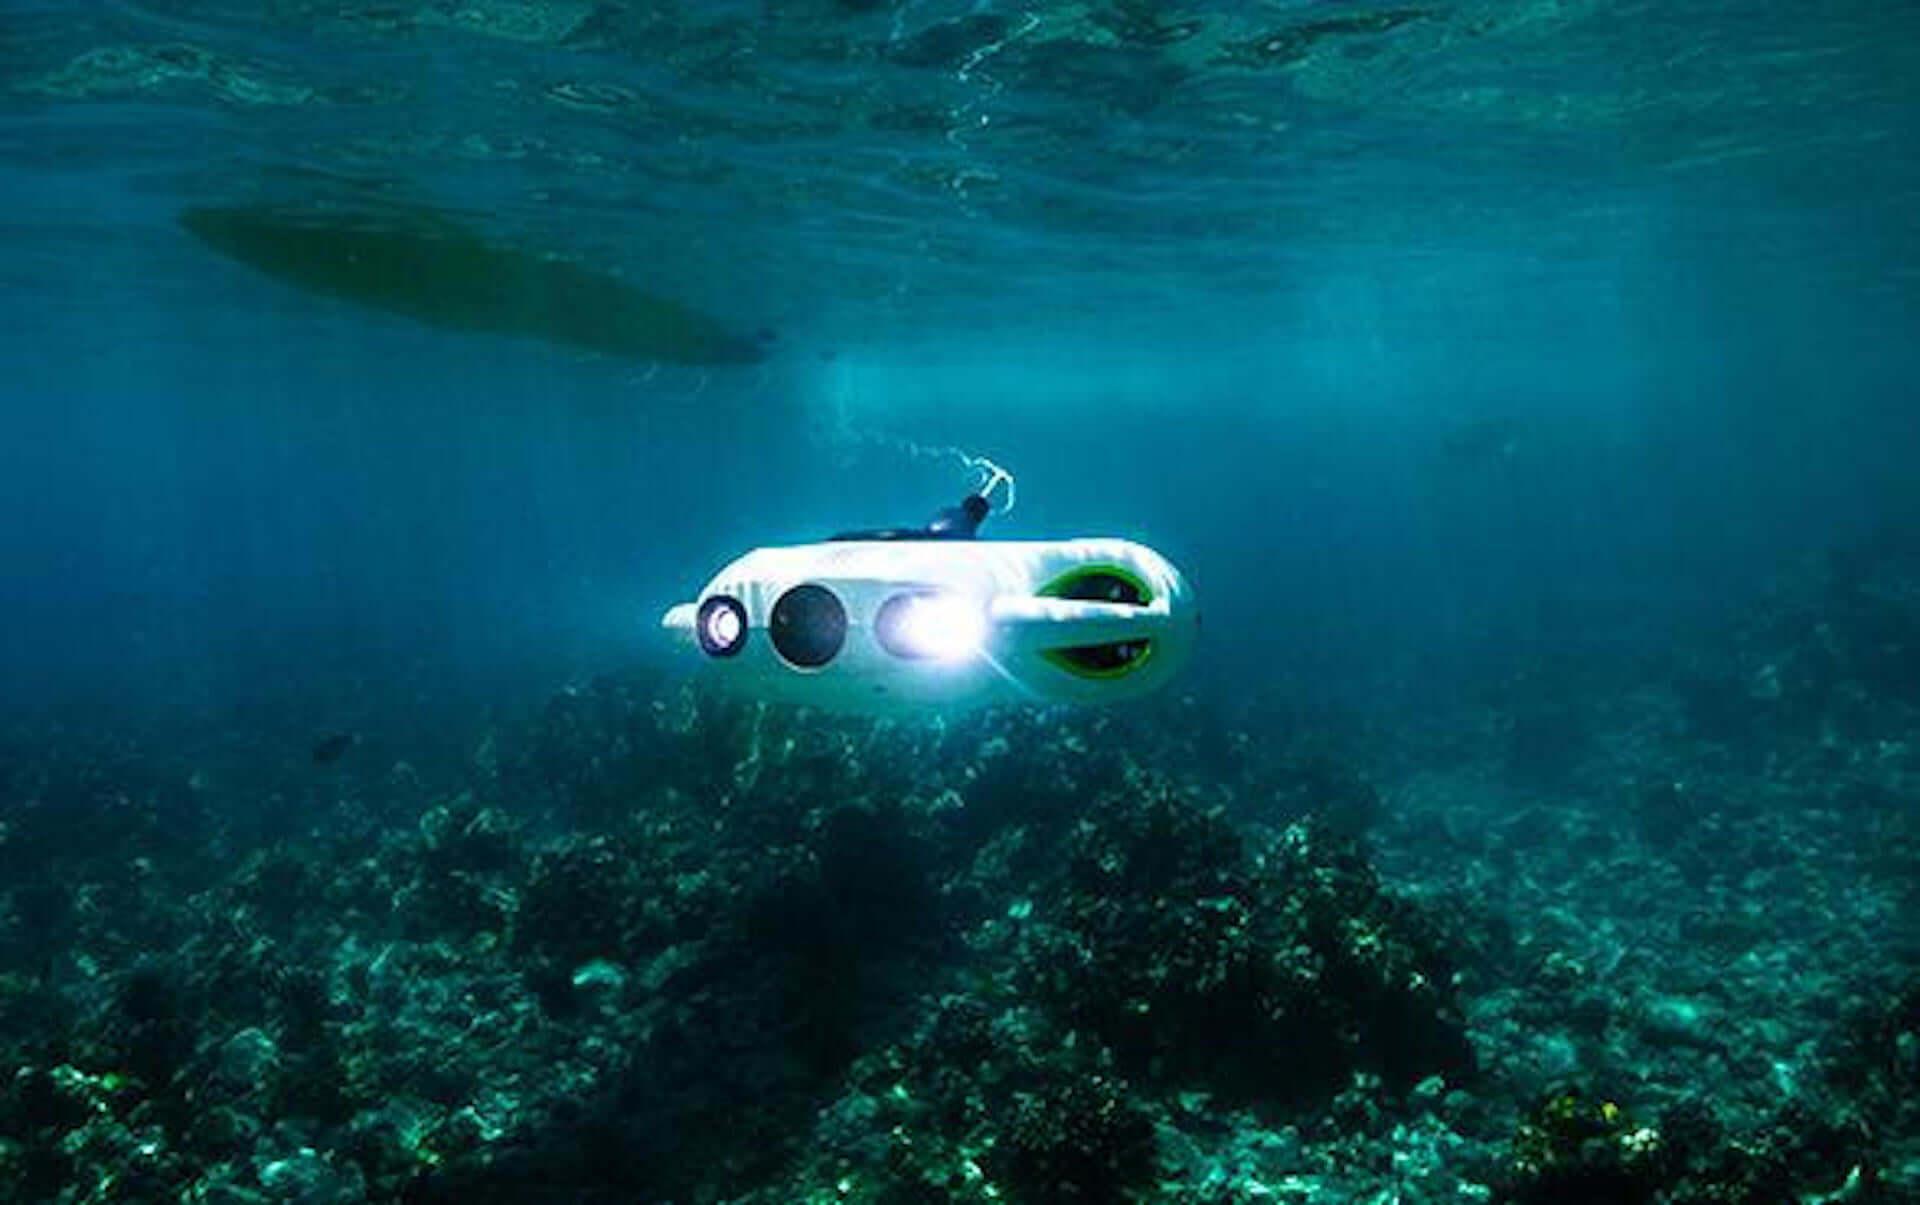 4Kカメラ&130度広角レンズ搭載の水中ドローン『BW Space Pro』がクラウドファンディングにて販売開始! tech200420_youcan_robot_2-1920x1205